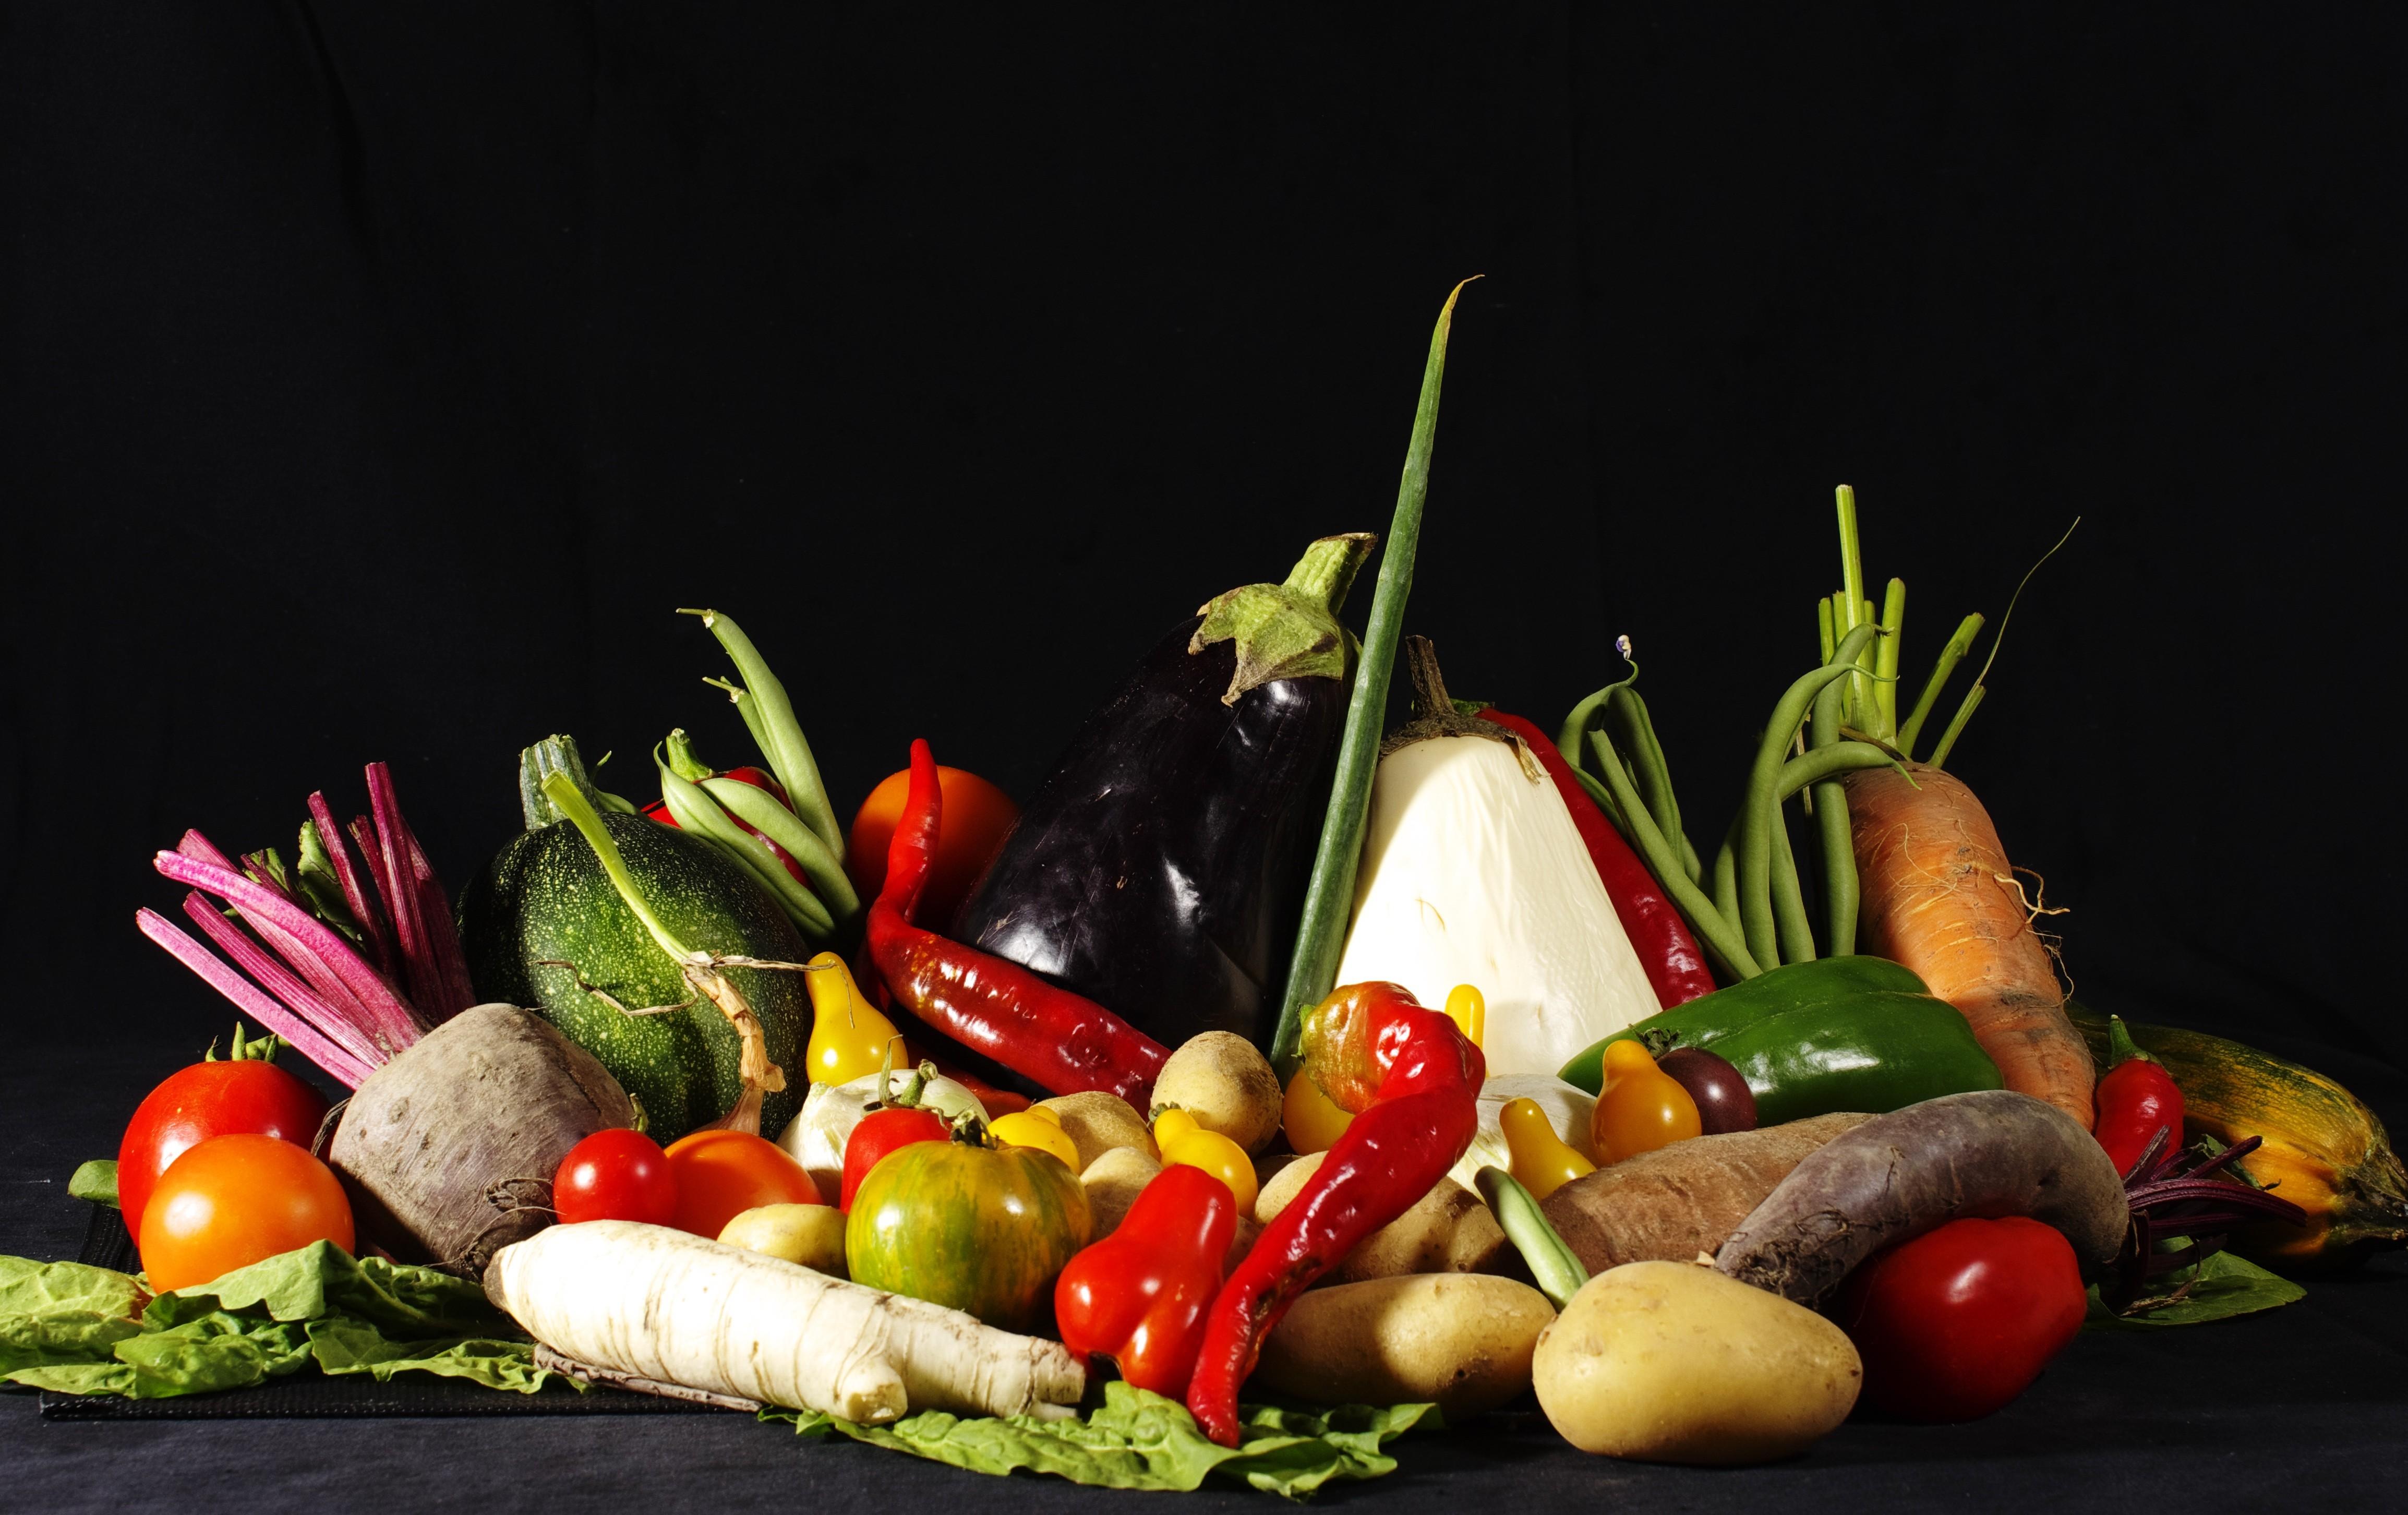 La dieta vegetariana fa dimagrire